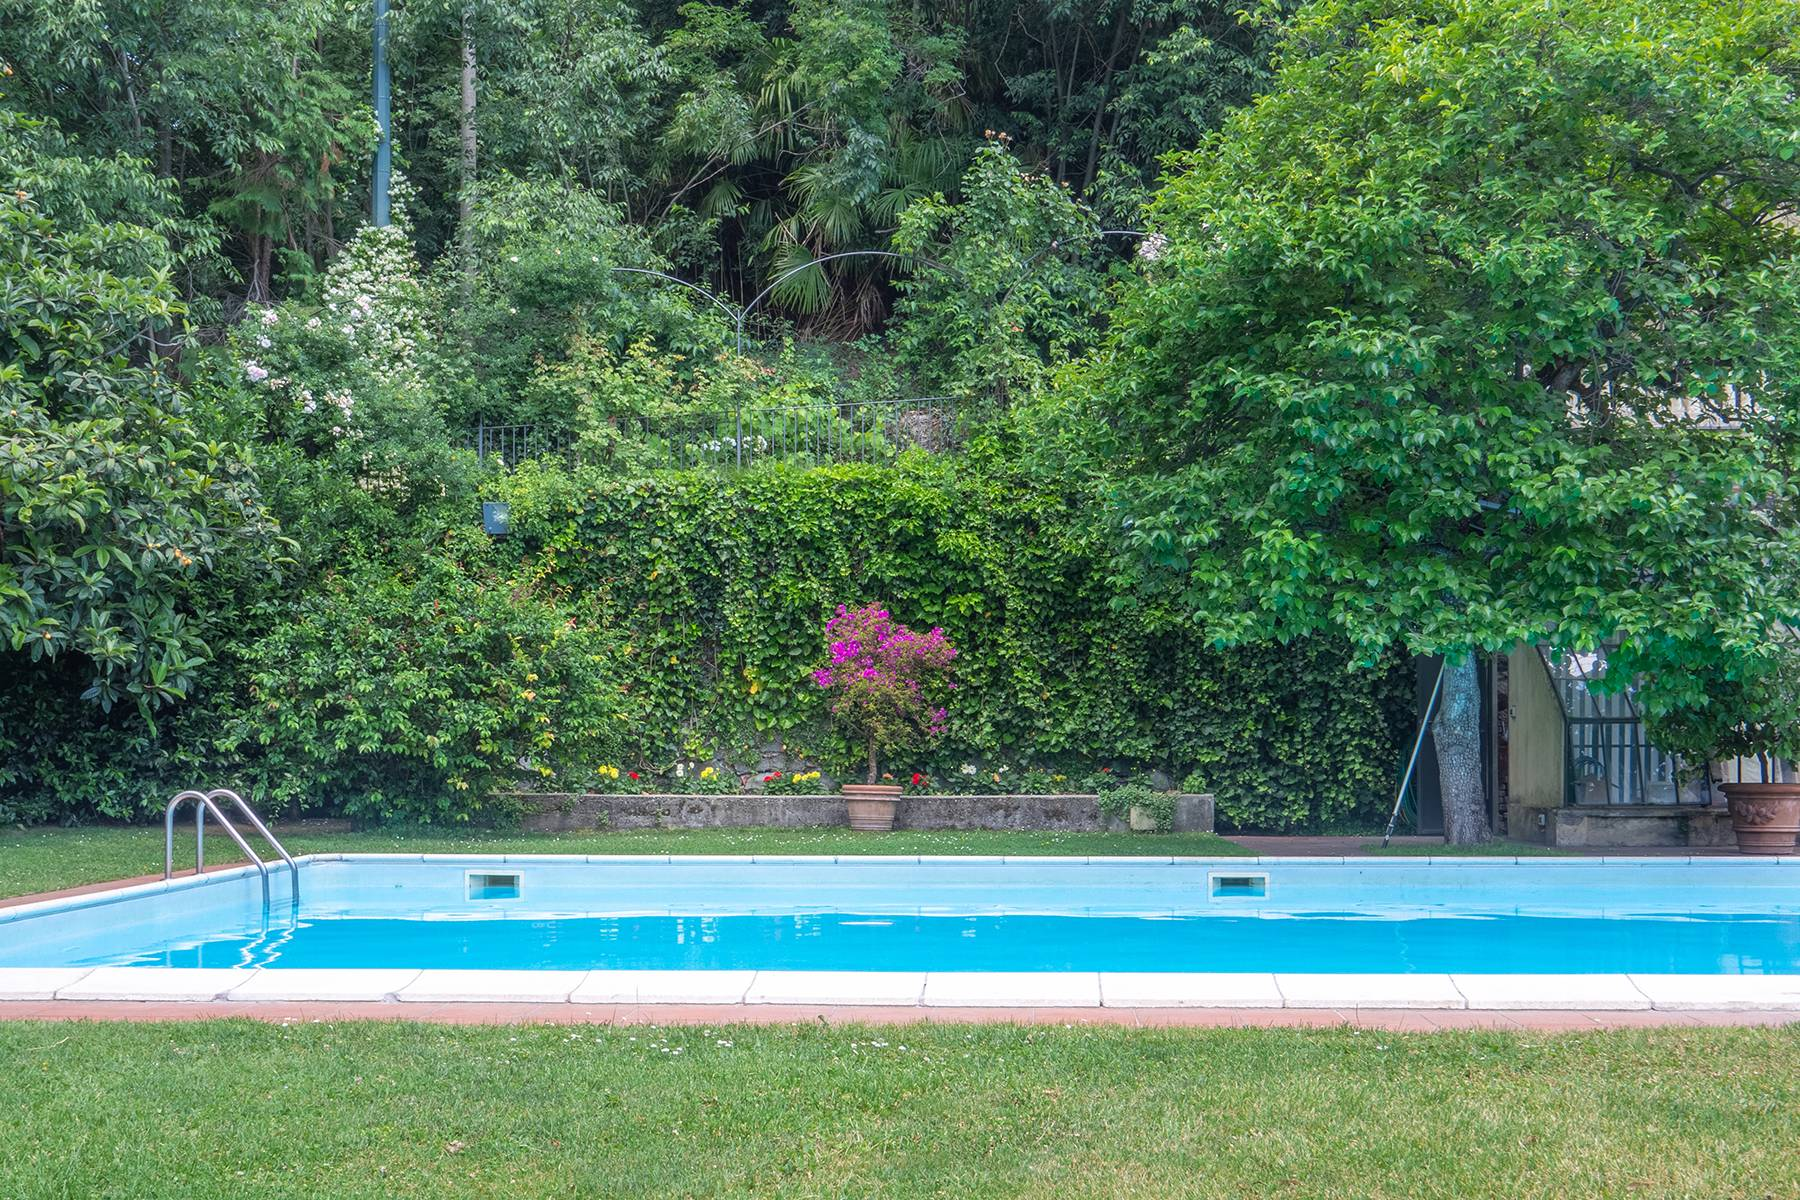 Casa indipendente in Vendita a Torino: 5 locali, 657 mq - Foto 21